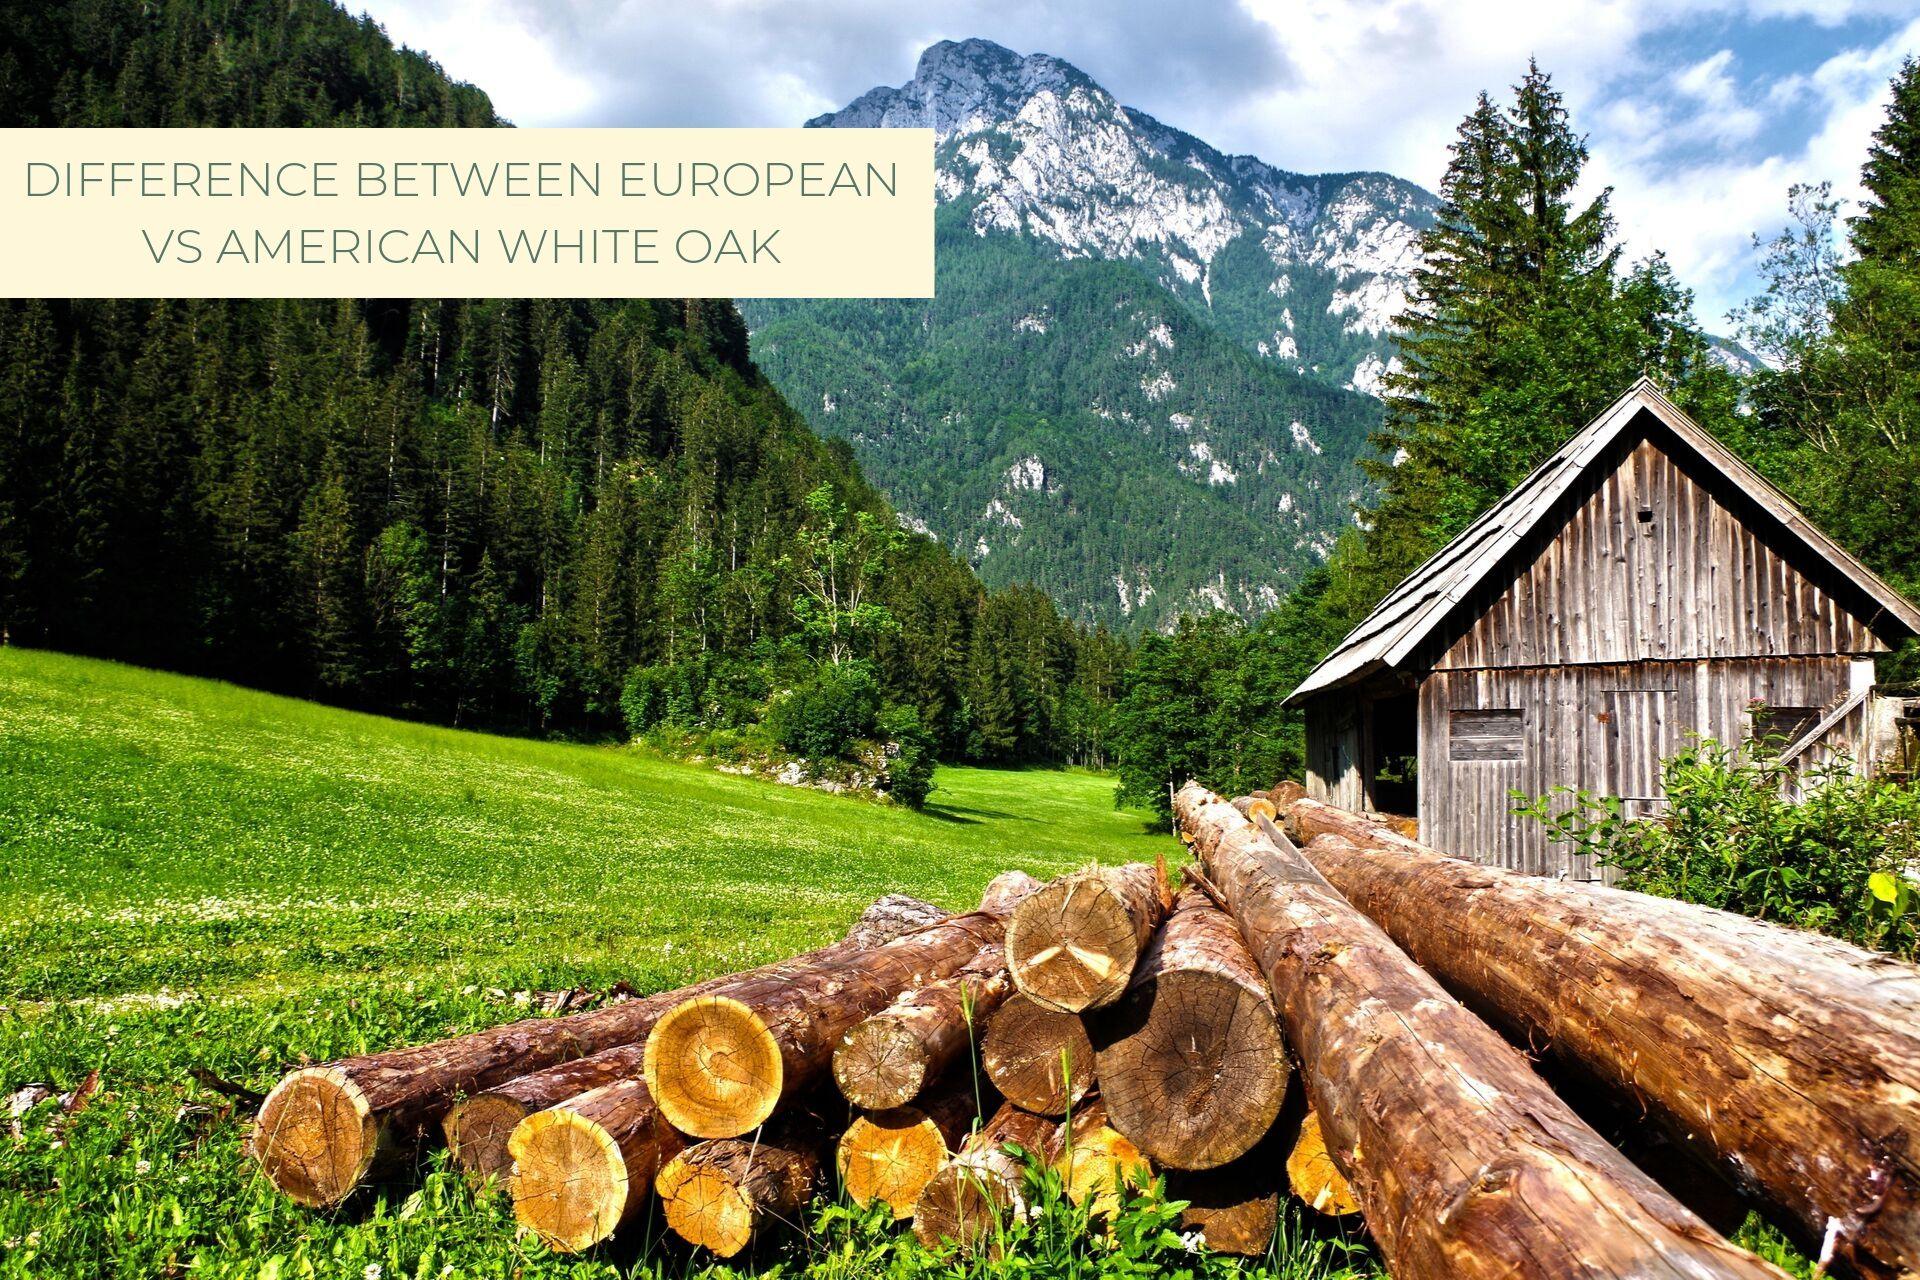 Castle Bespoke_ Difference between European v_s American White Oak